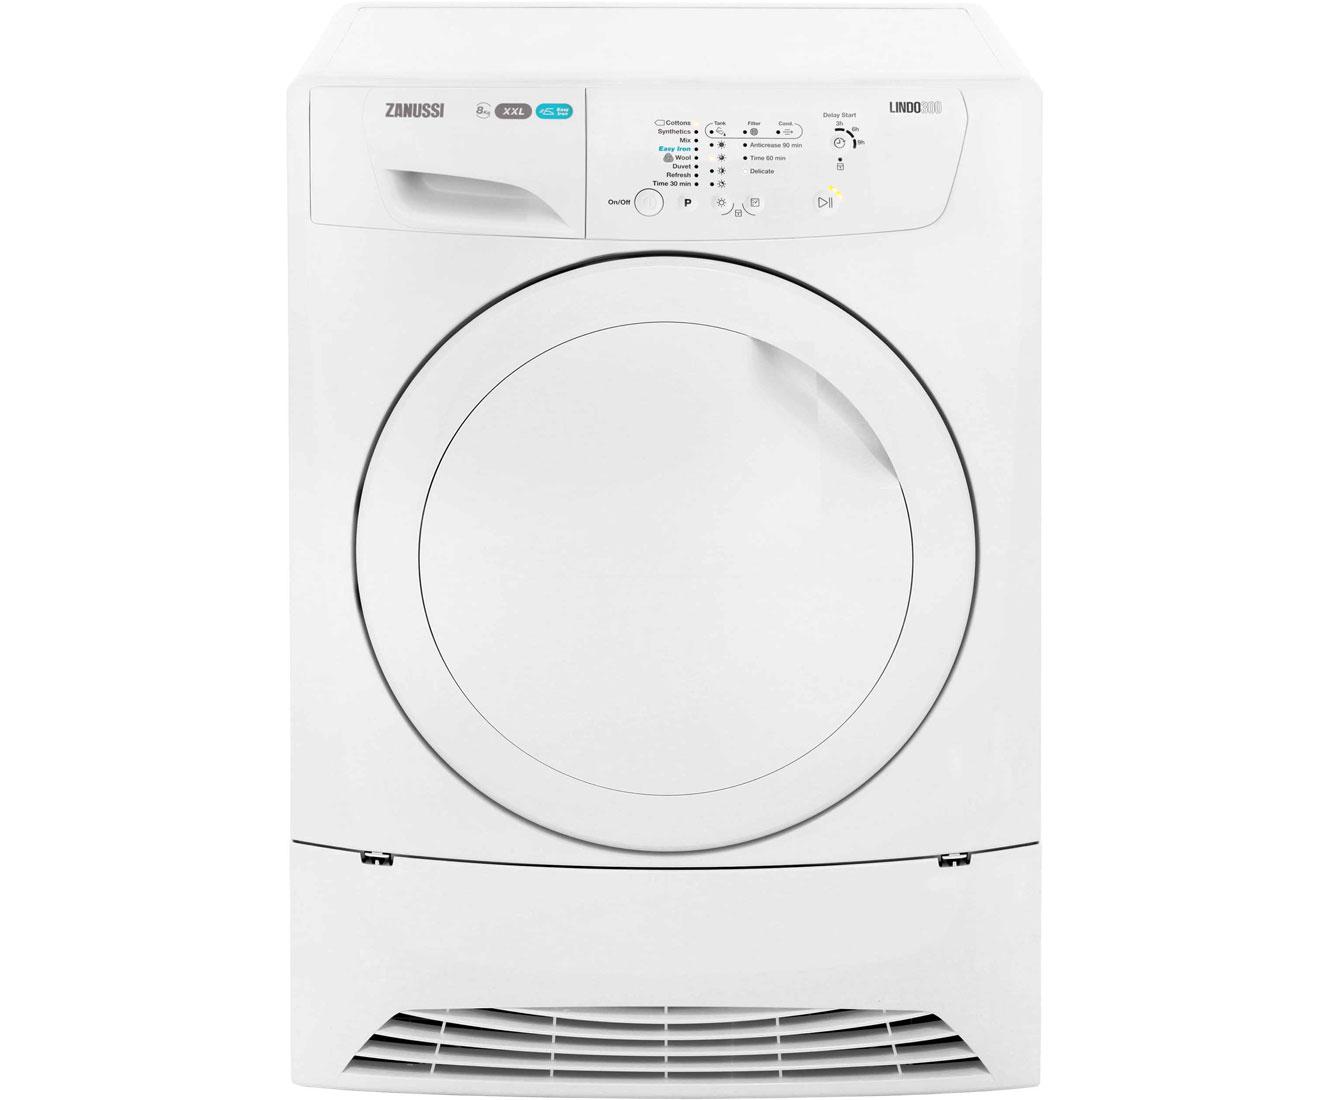 Zanussi Lindo300 ZDC8202P Free Standing Condenser Tumble Dryer in White